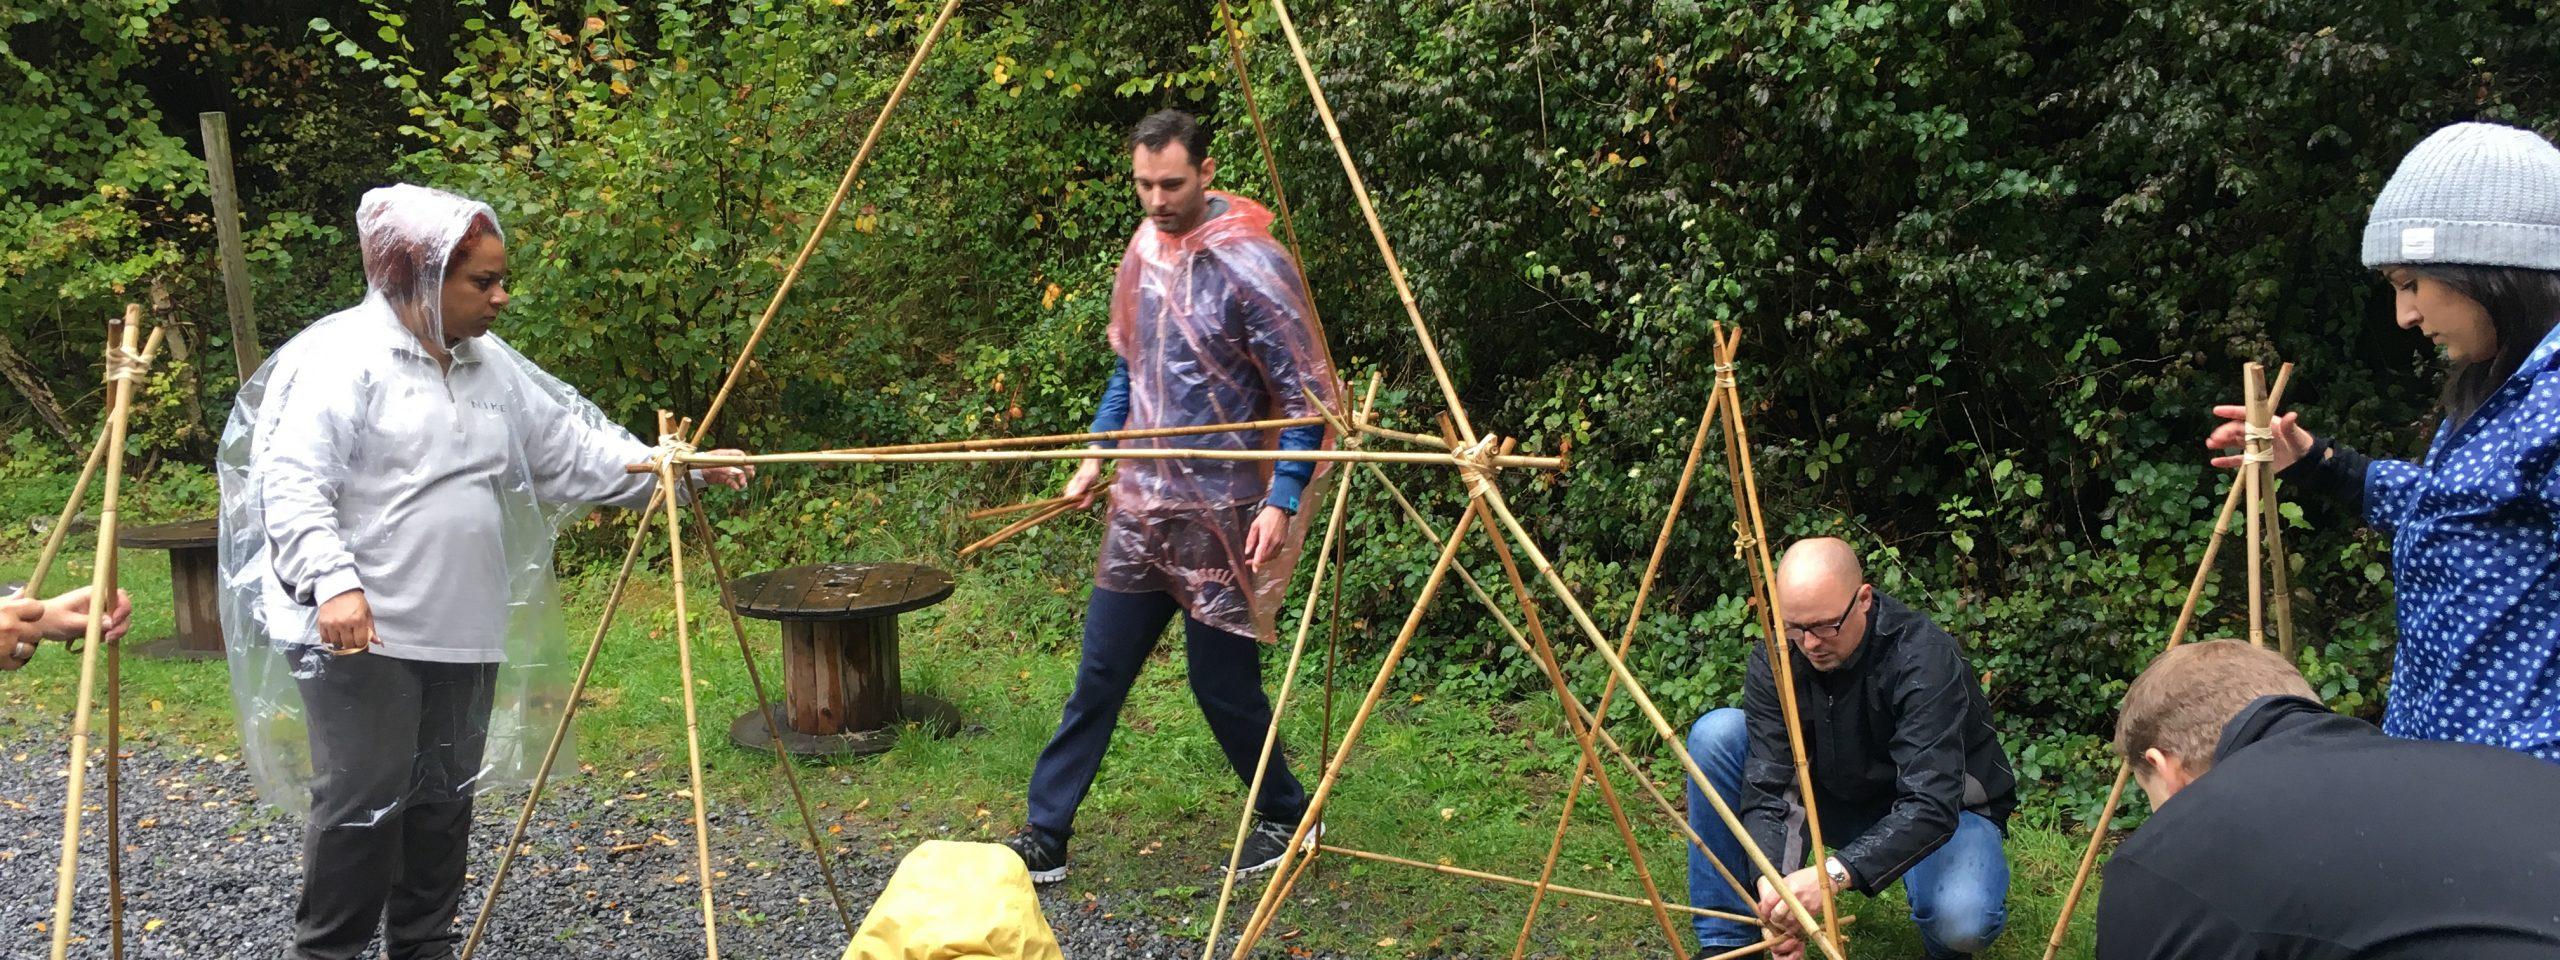 teambuilding-eindhoven-adventure